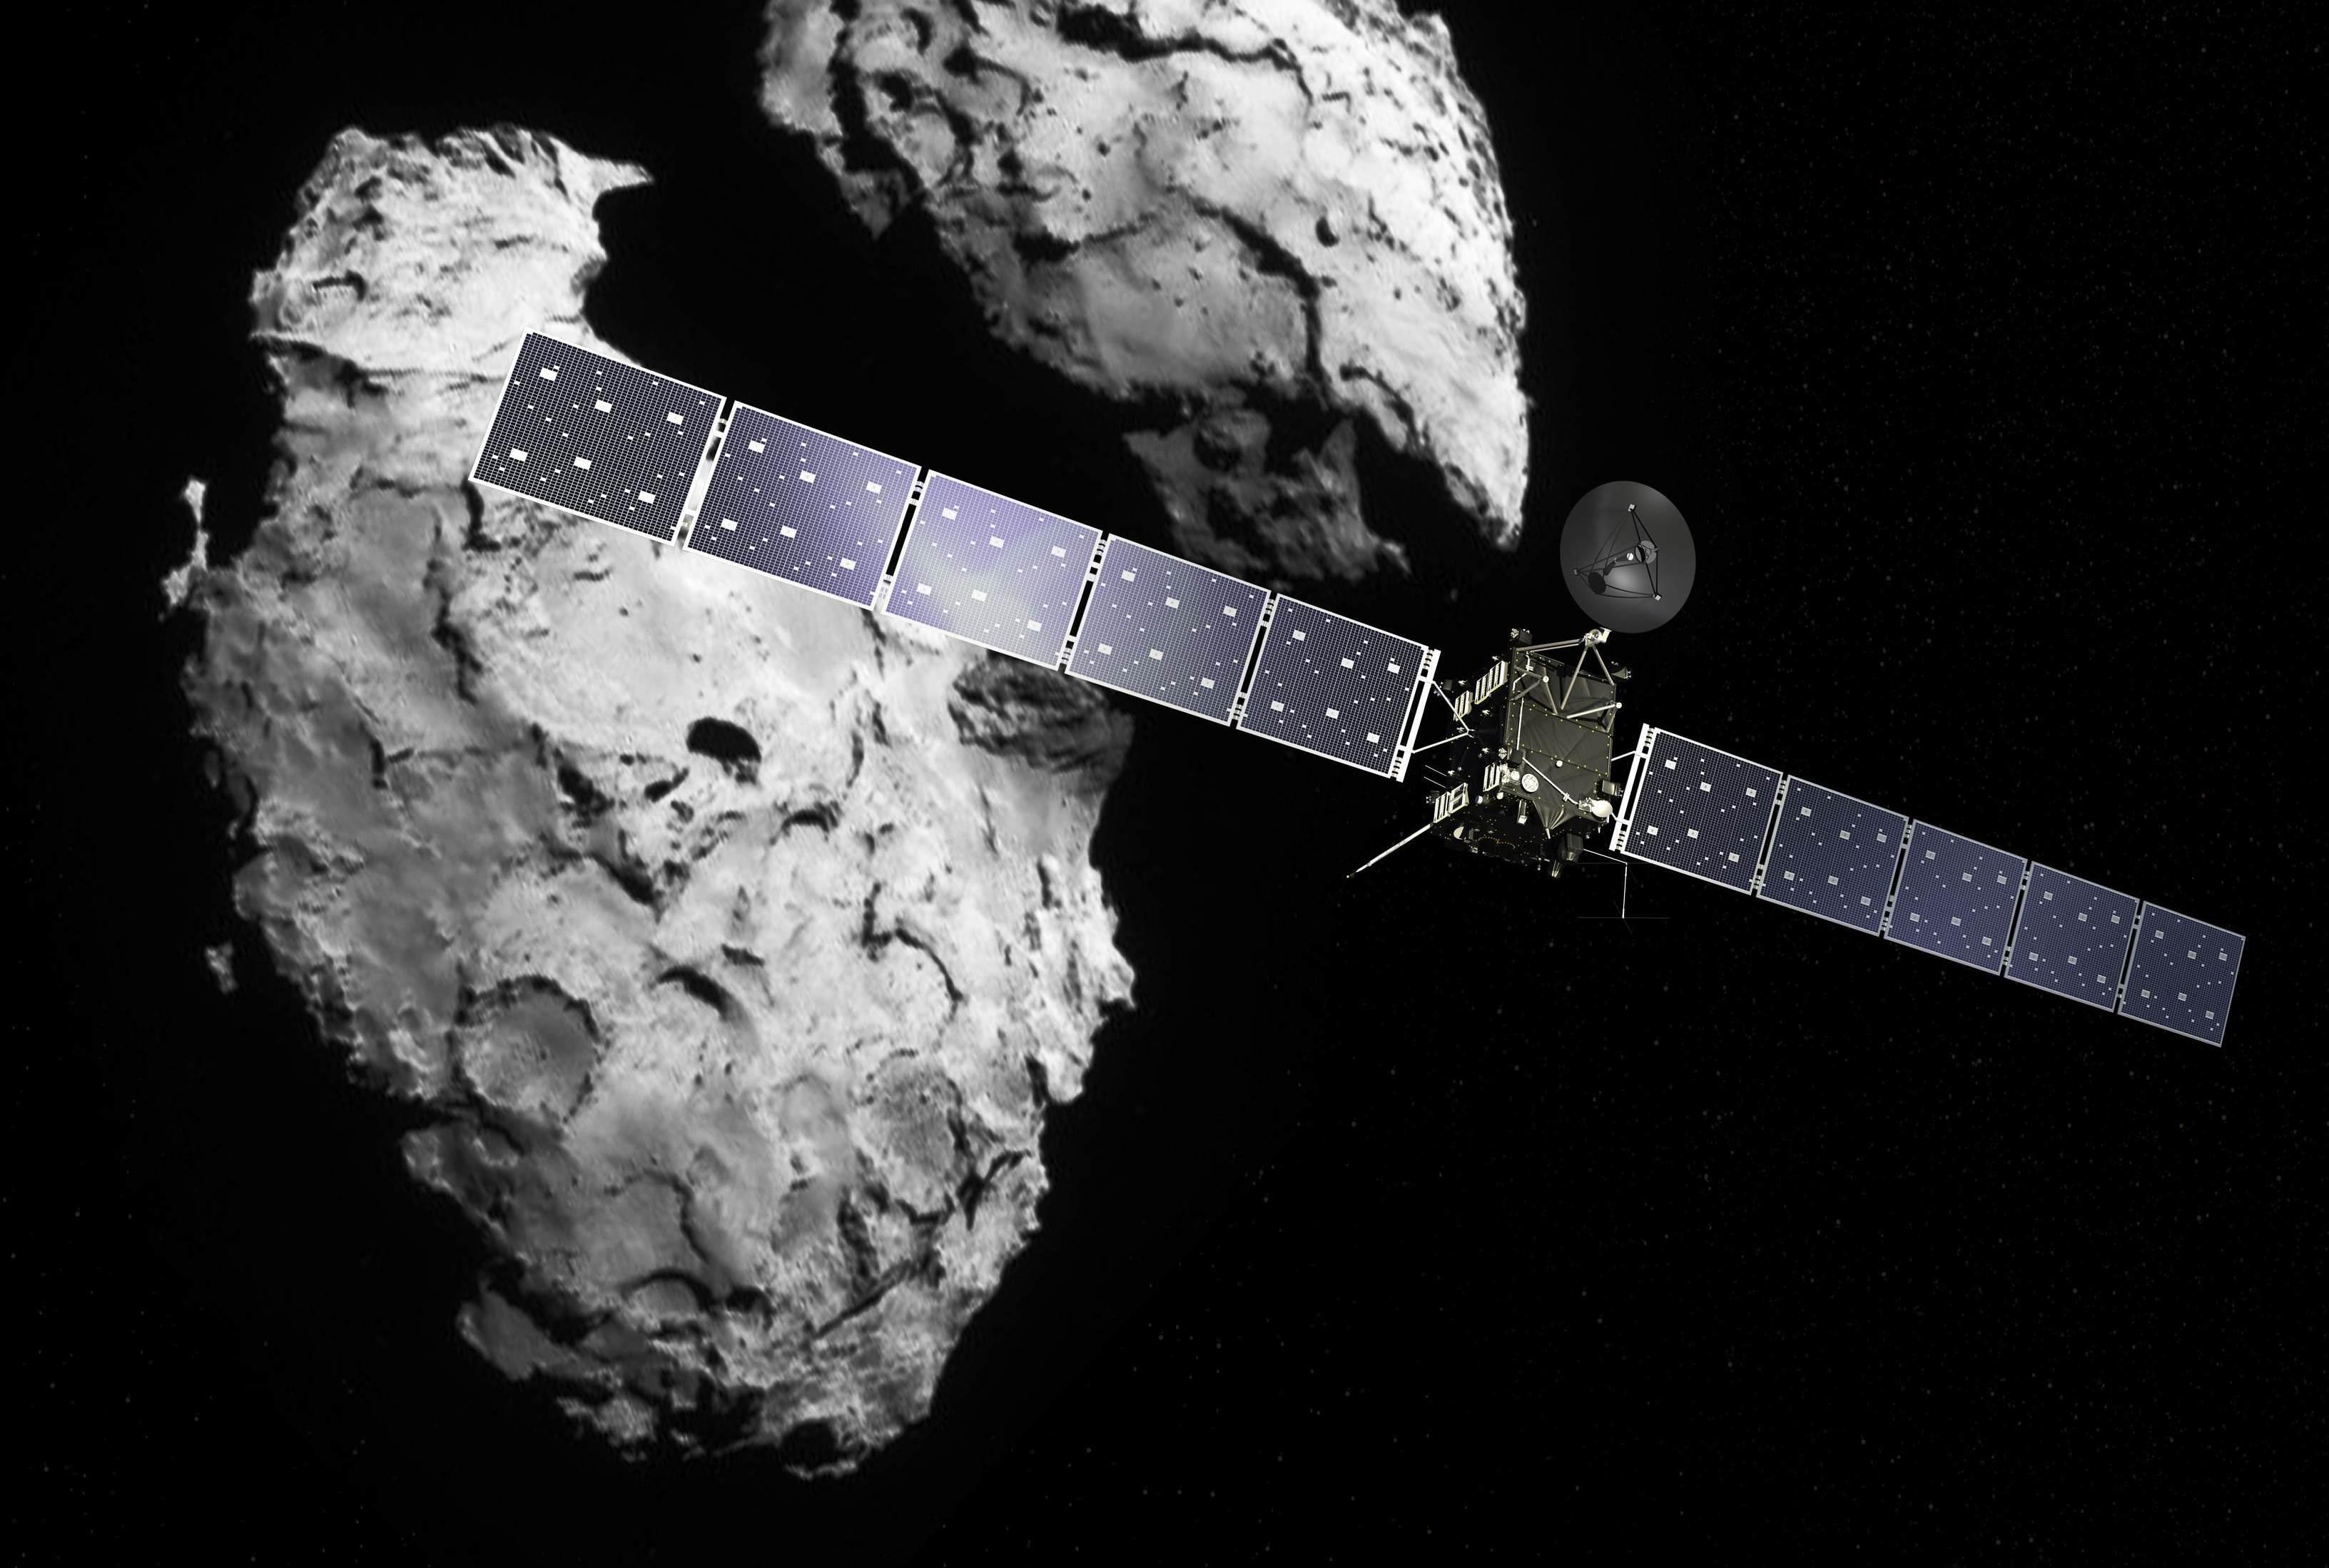 How Rosetta gets passivated | Rosetta - ESA's comet chaser Rosetta